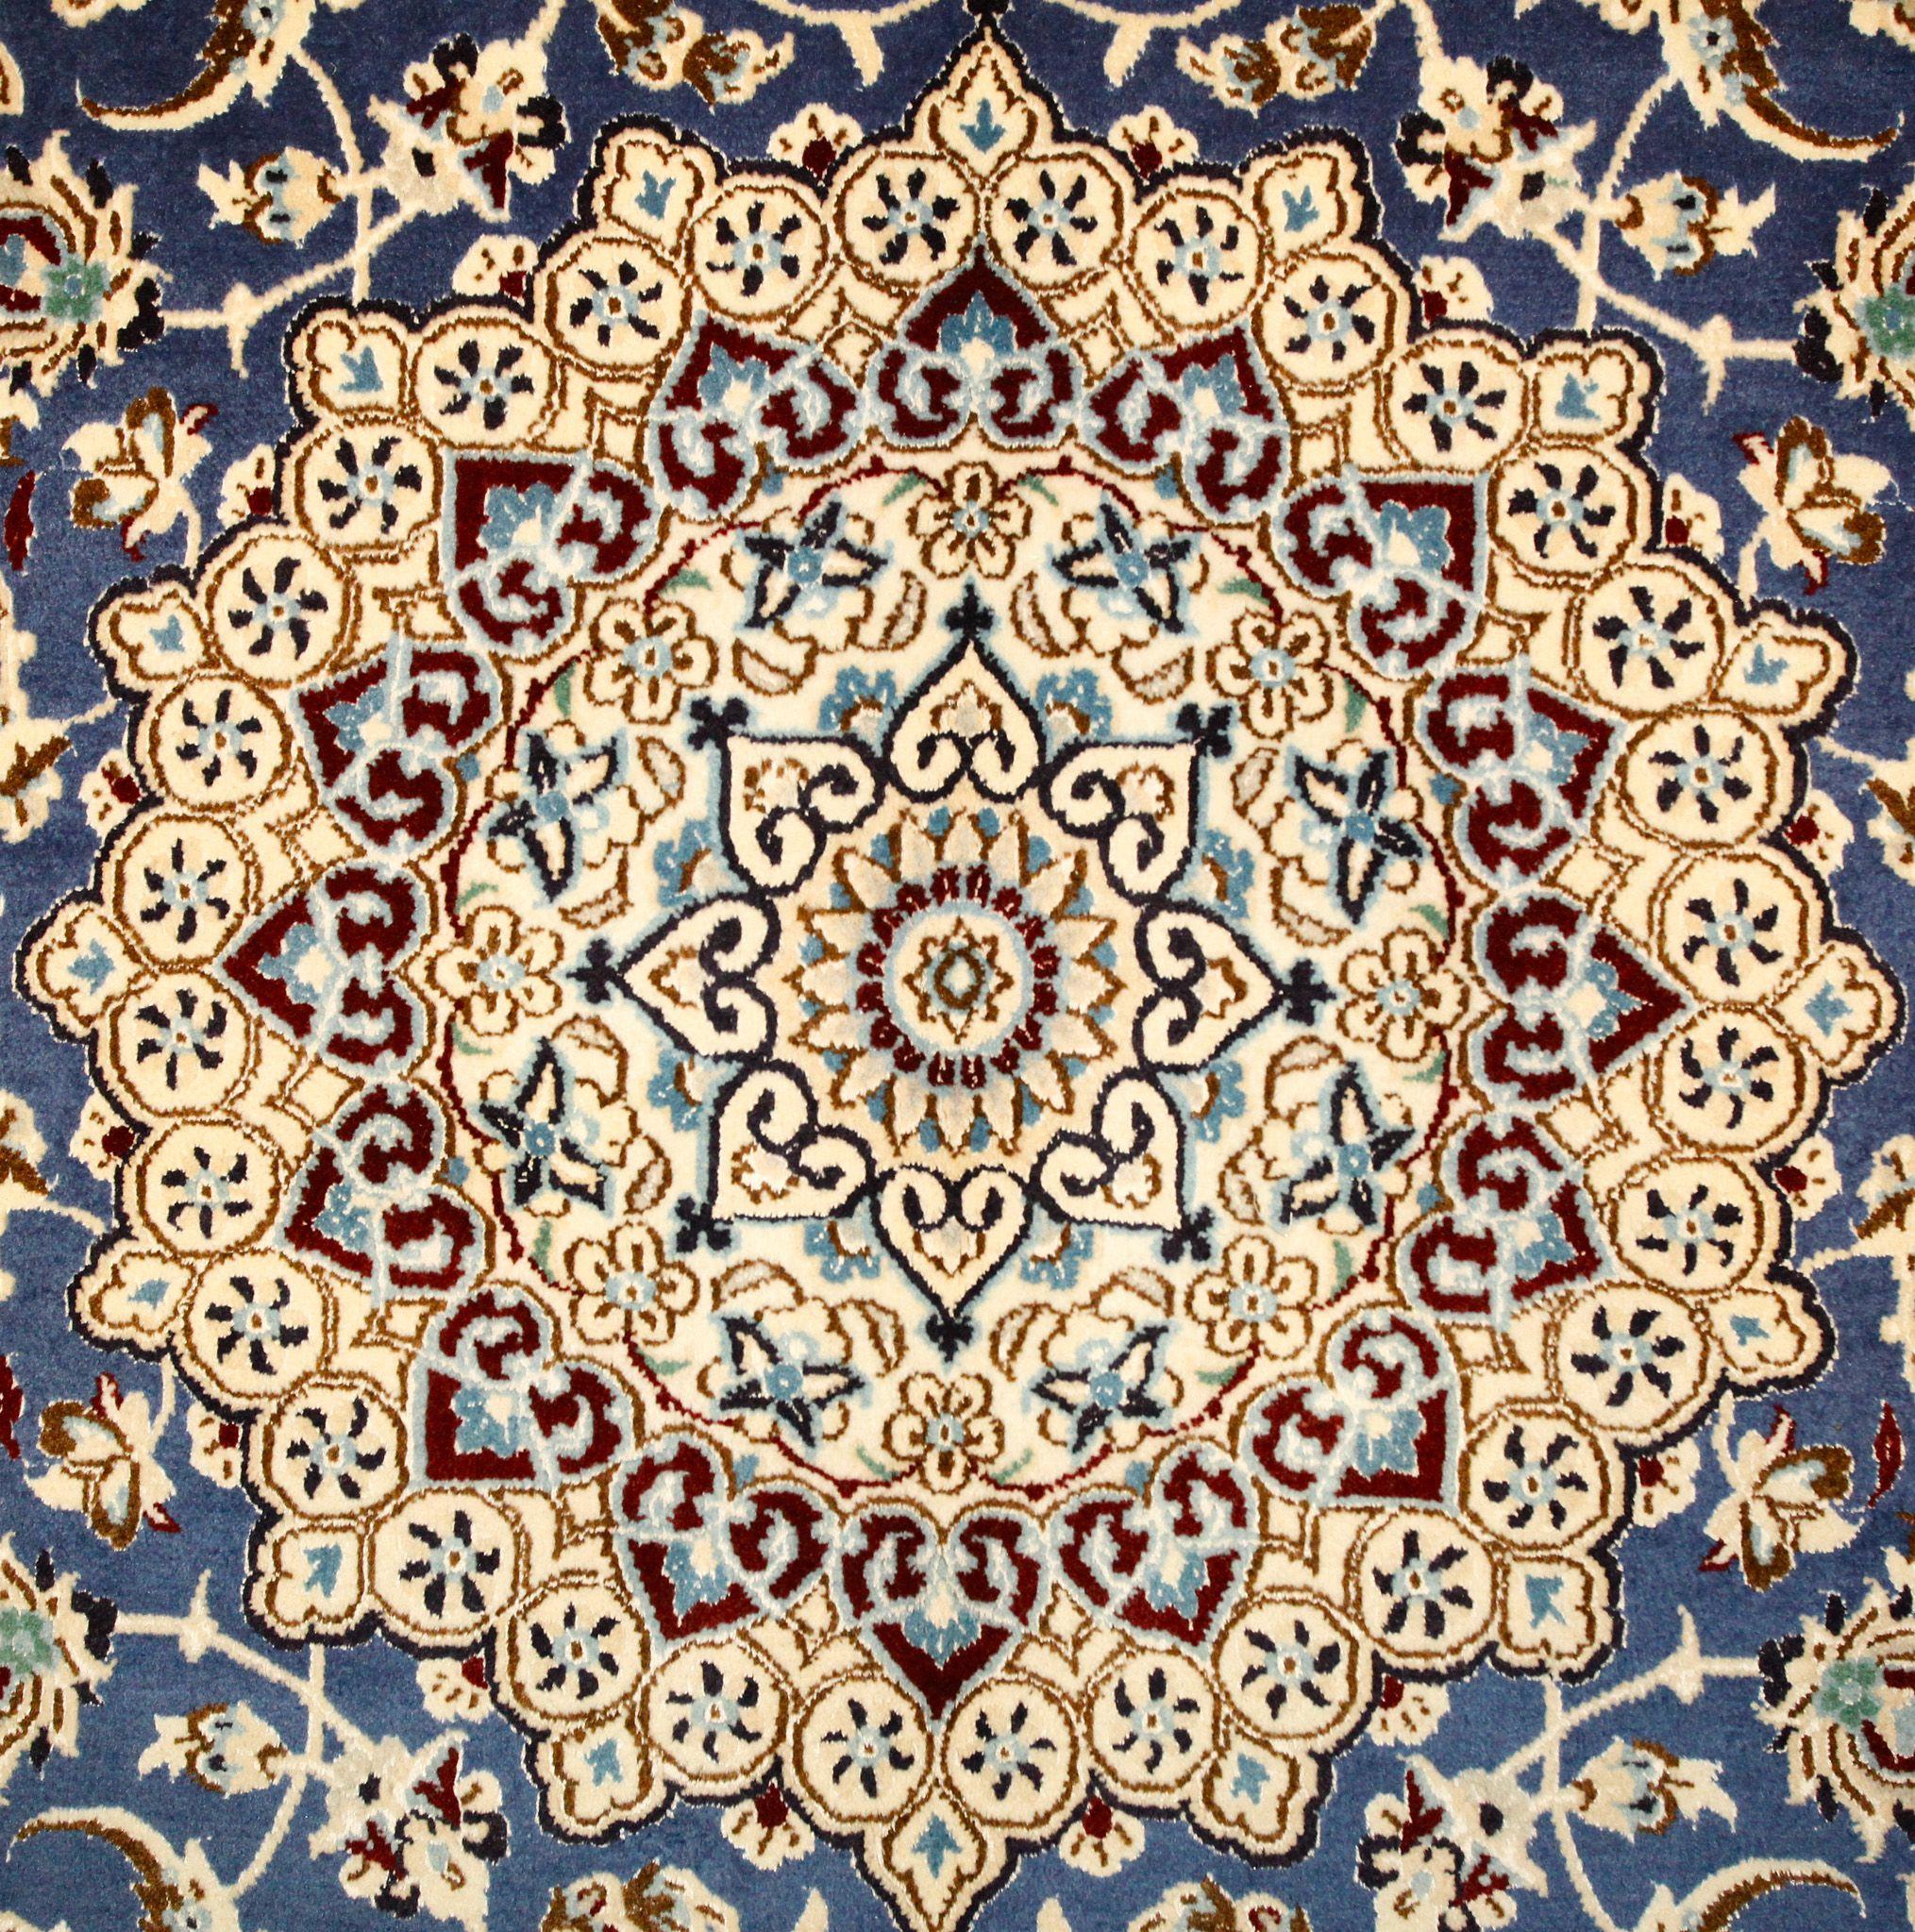 tappeto nain 9la 2,50x1,50 | shopping online - antonio potenza srls